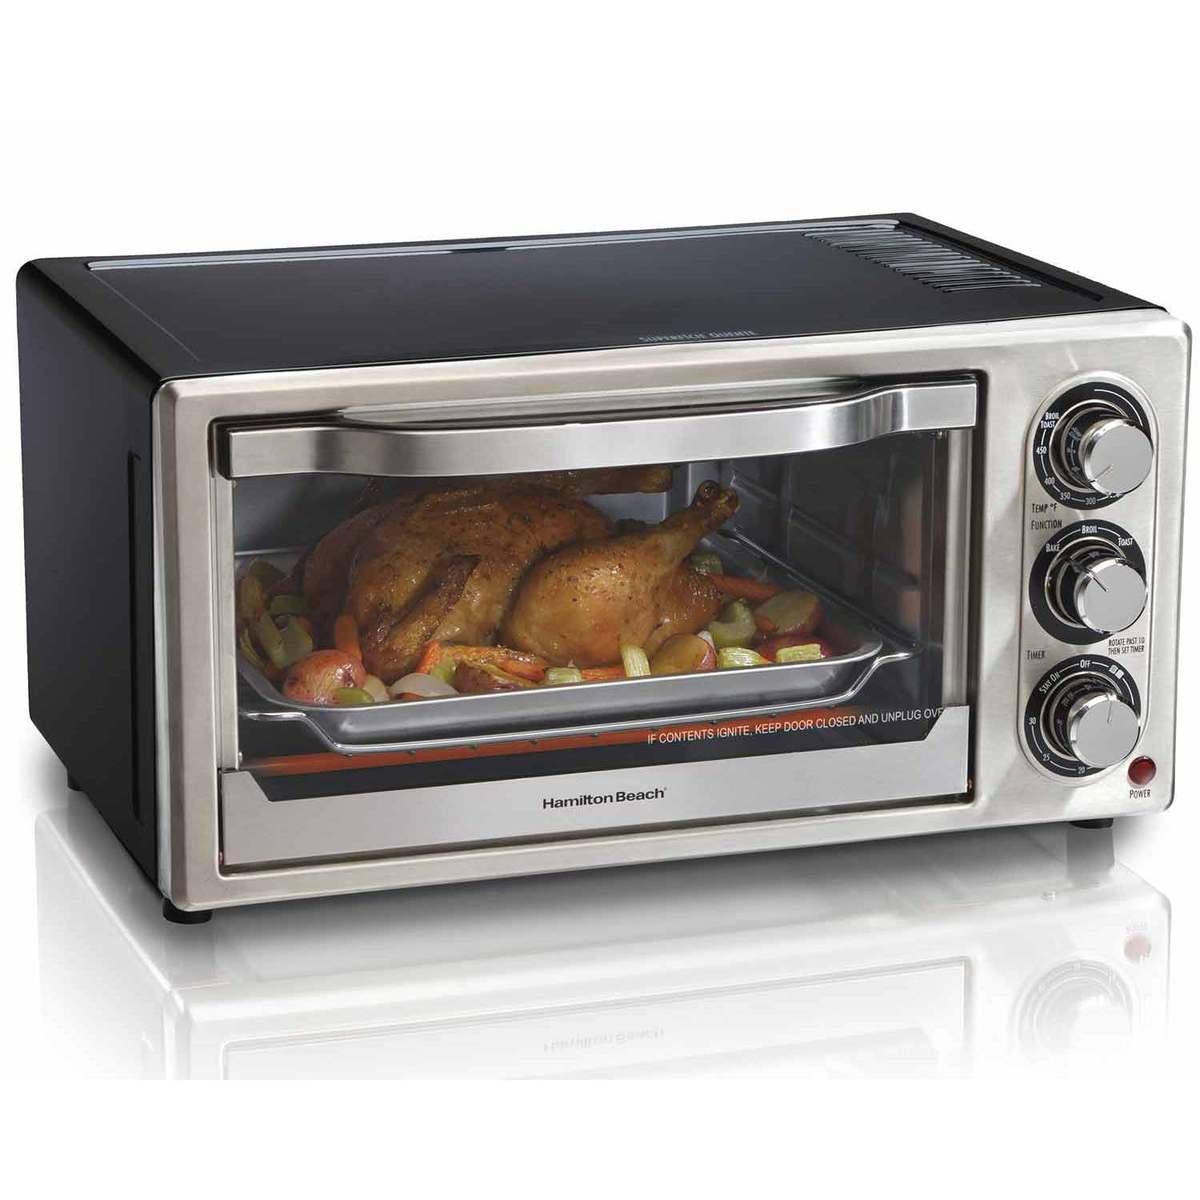 6 Slice Toaster Oven (31510)